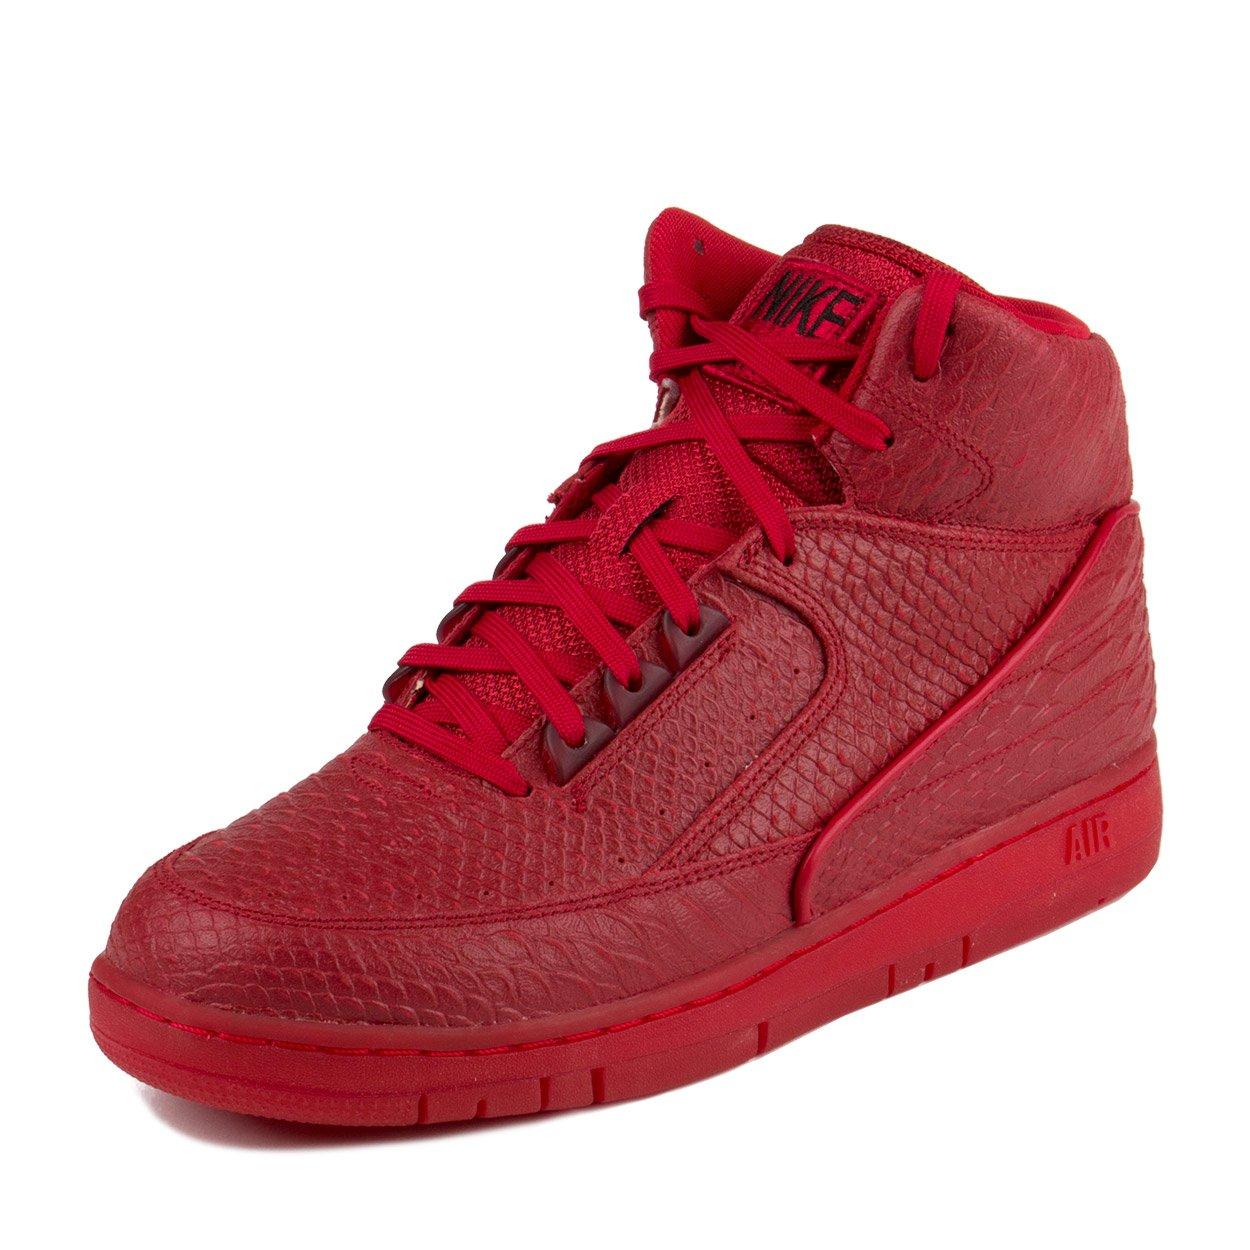 cc787fe84d421 Nike Mens Air Python Prm Gym Red/Black Basketball Shoe 8 Men US